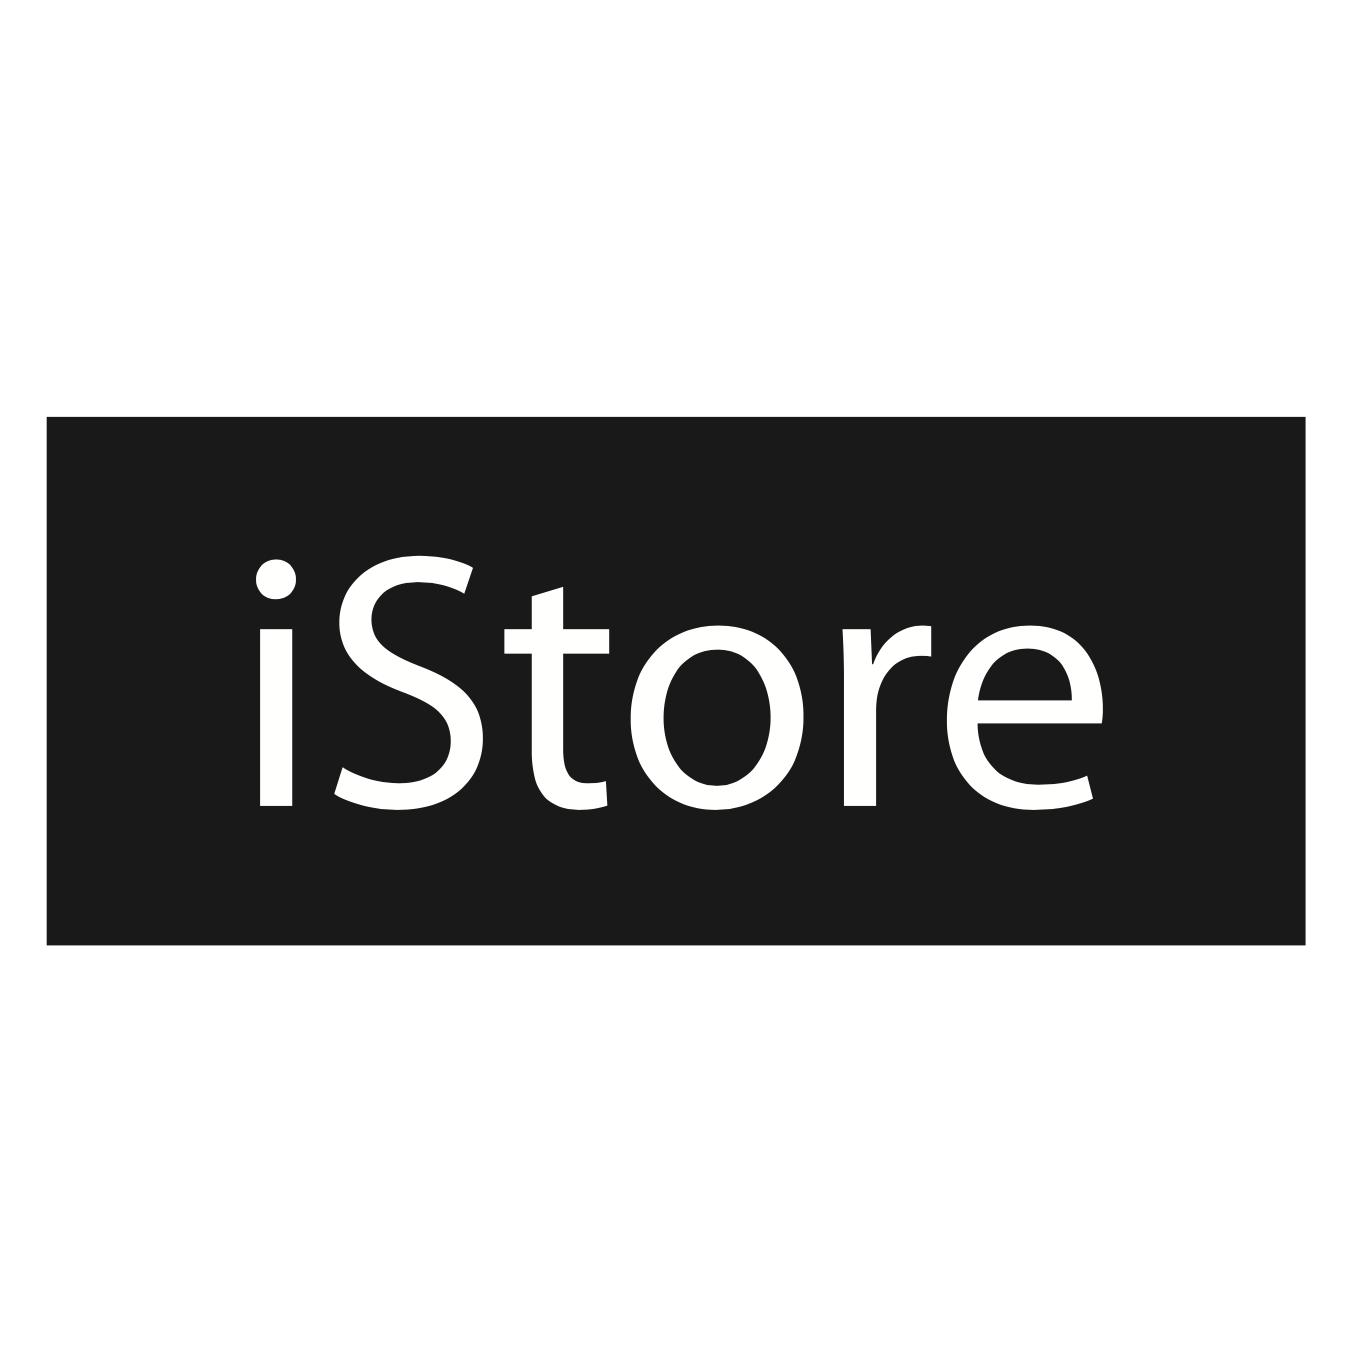 iPhone 6 Plus 16GB - Space Grey